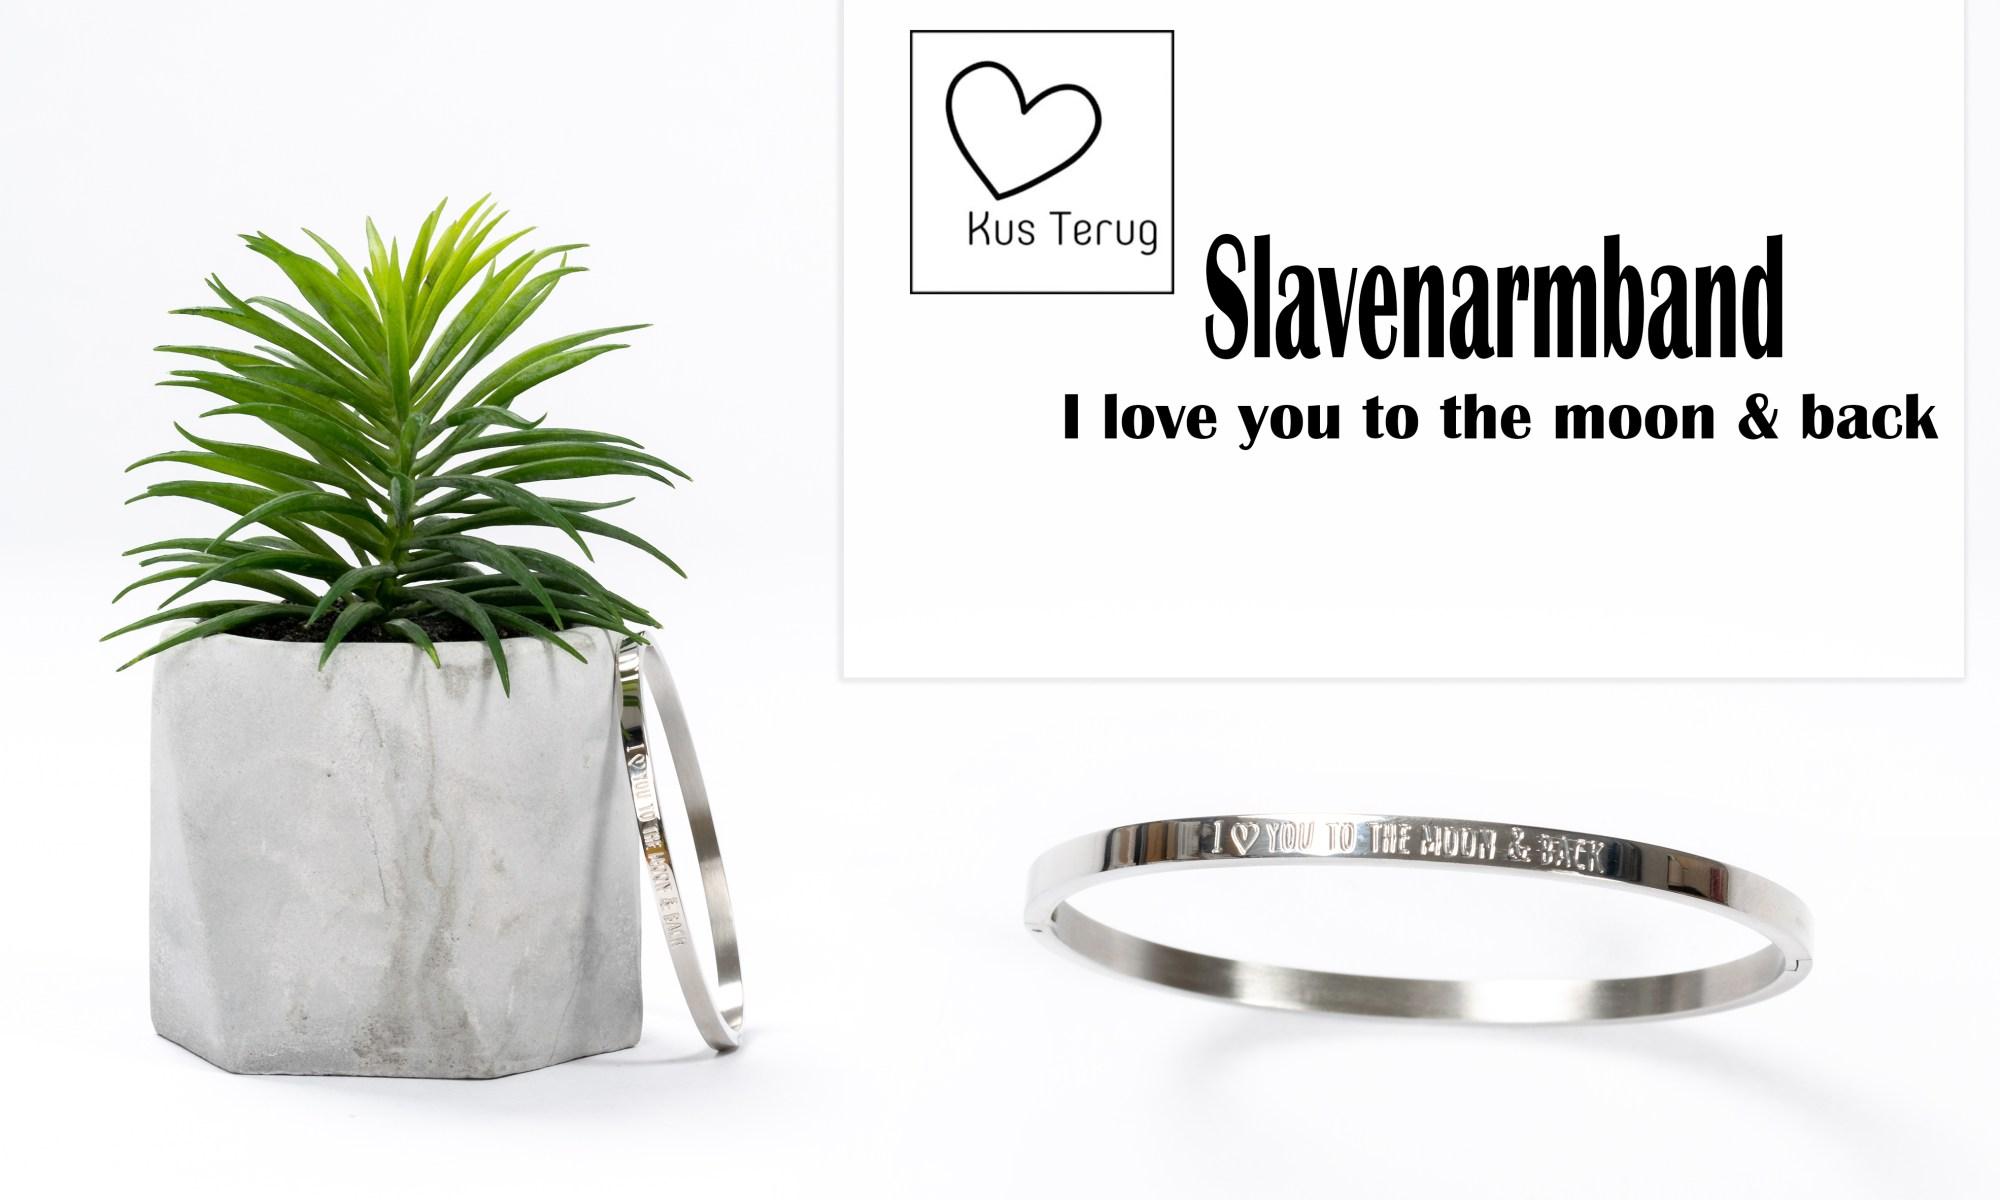 slavenarmband kus terug sieraden mamablog-neborn-baby-review-liefkleinwonder- www.liefkleinwonder.nl